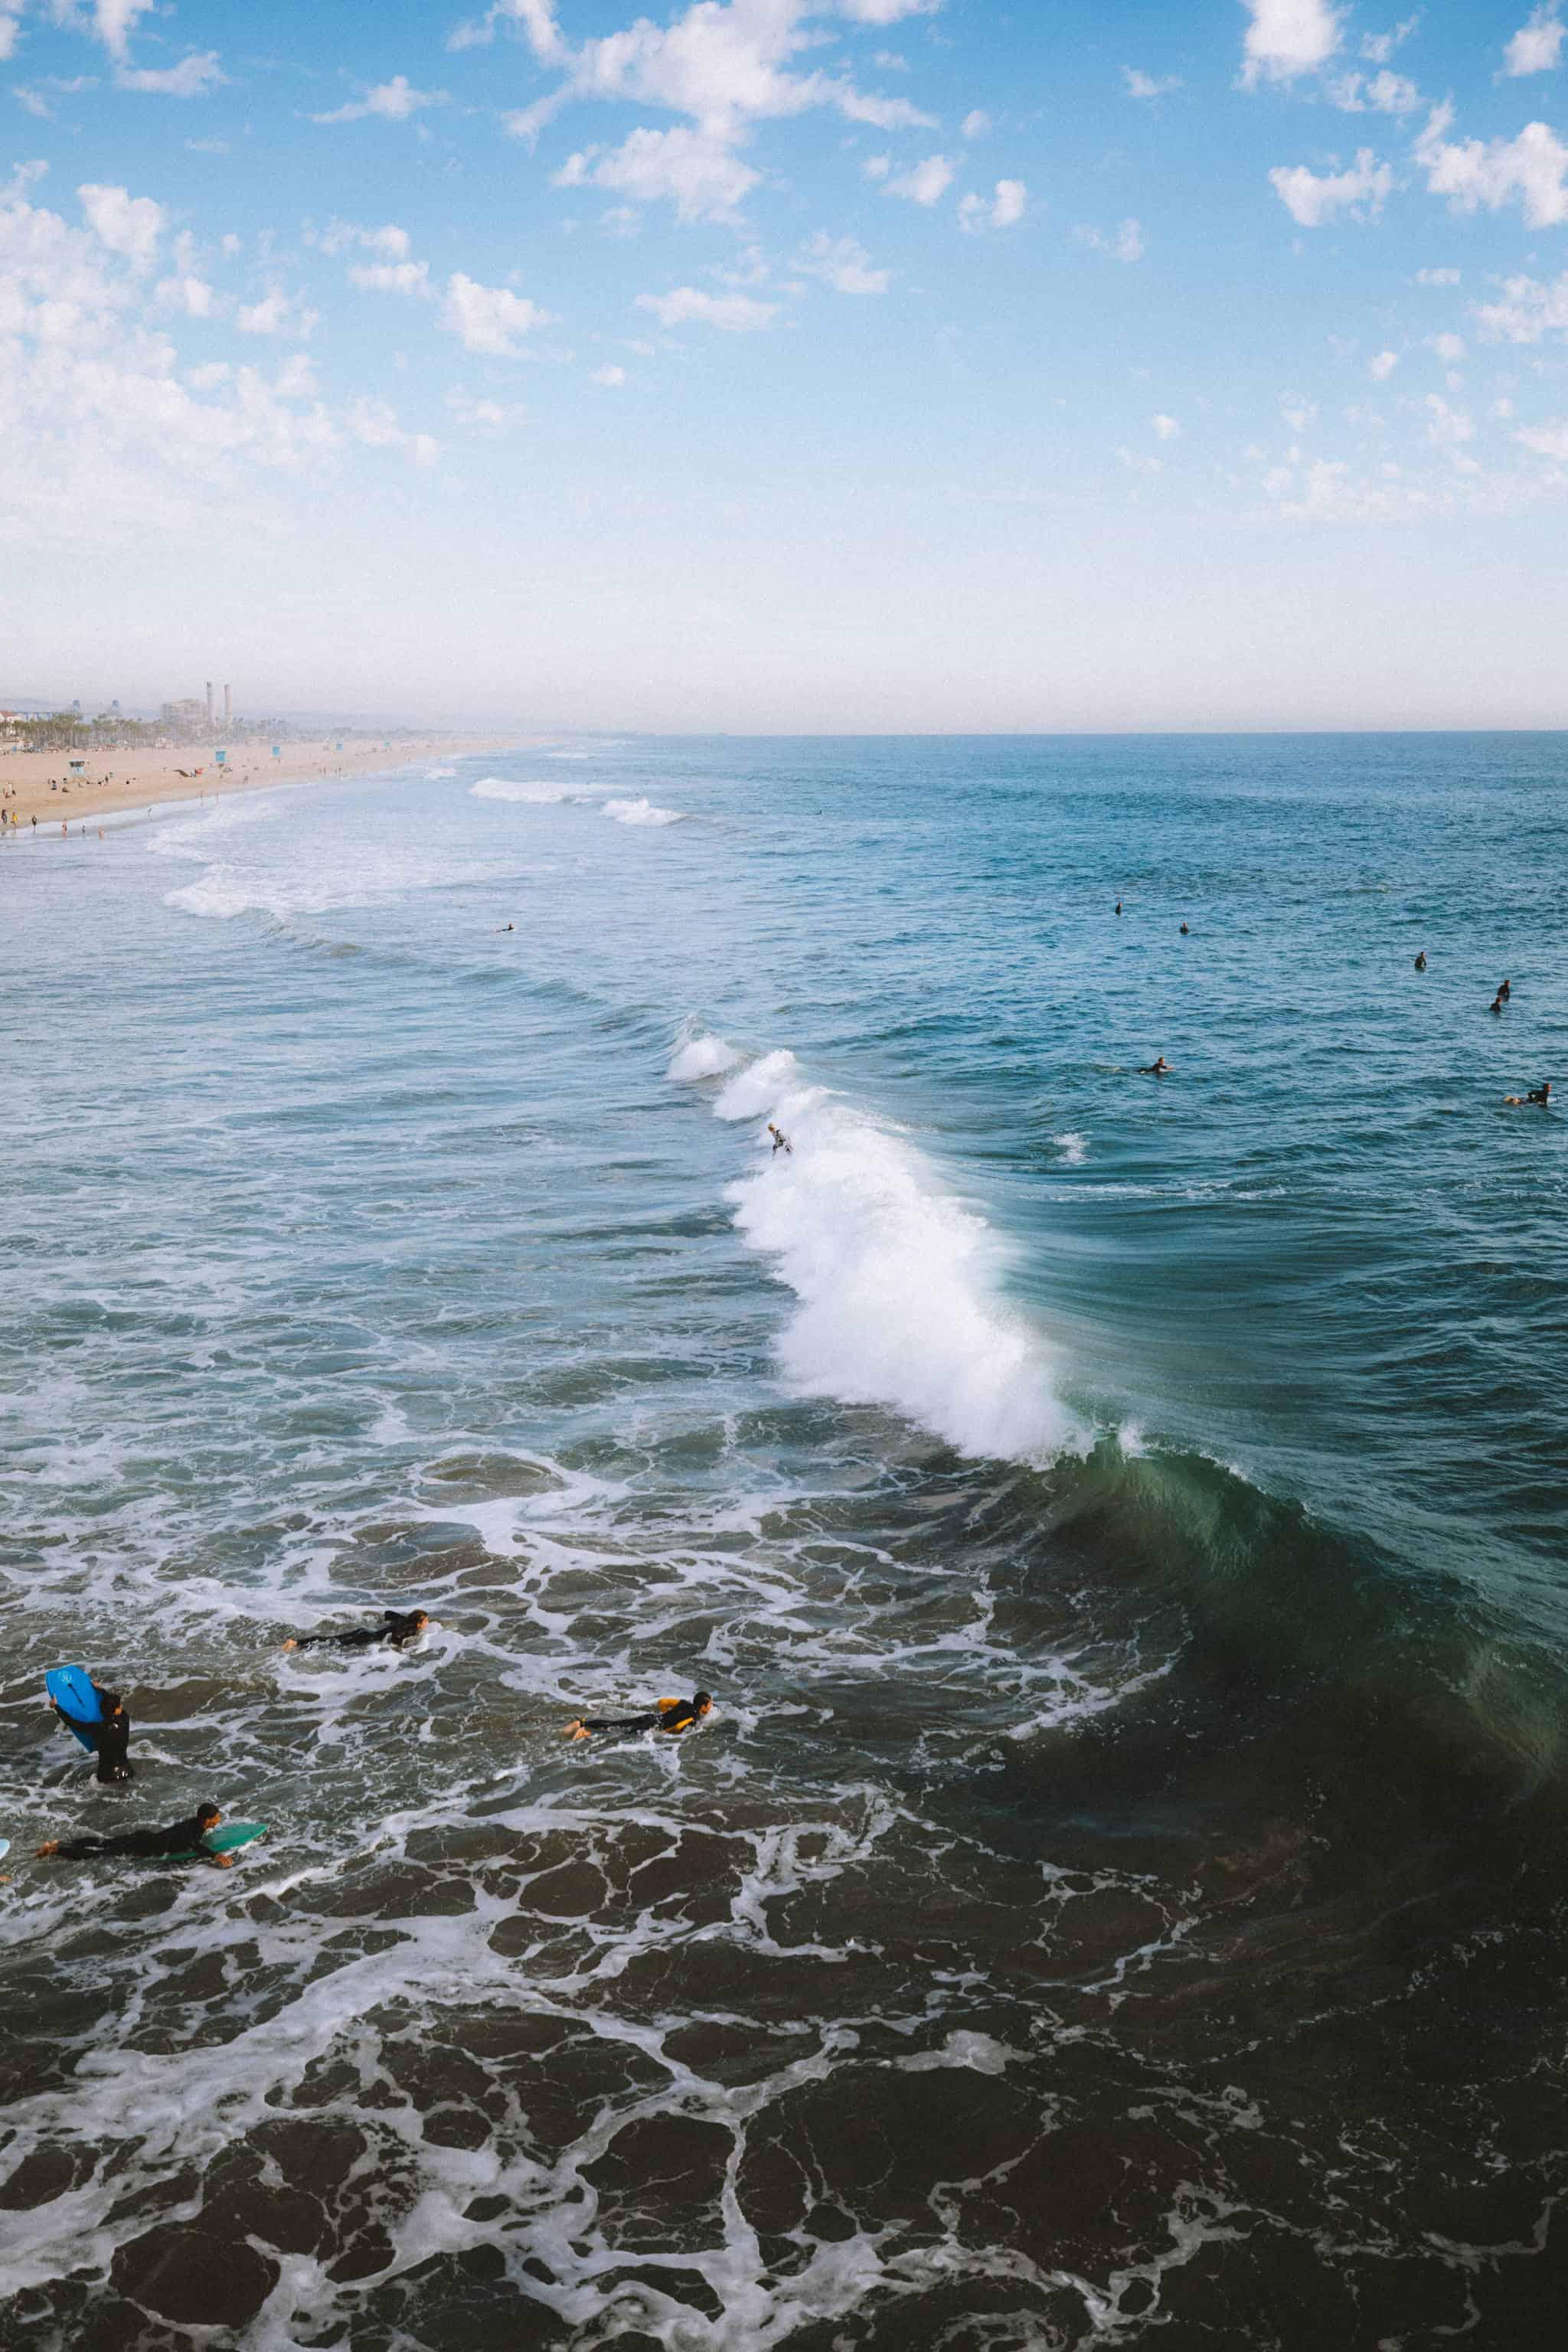 Places To Go In Orange County - Huntington Beach Pier - TheMandagies.com